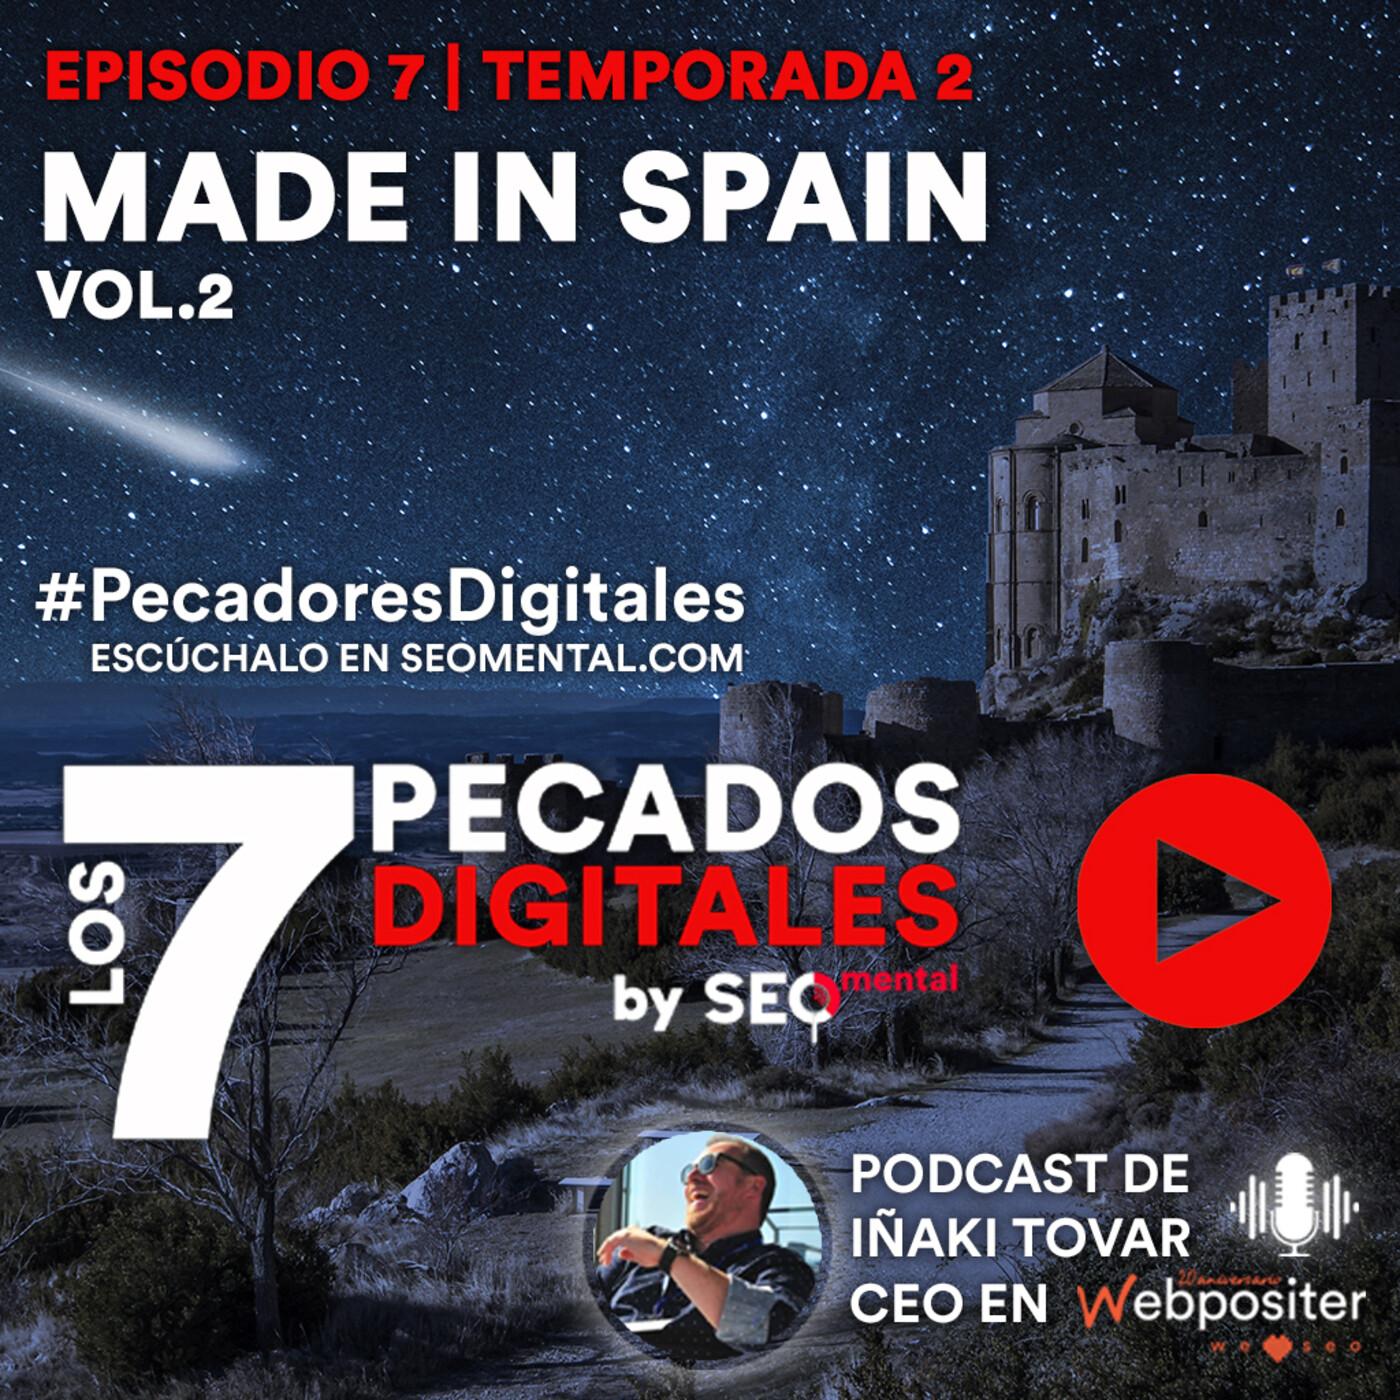 Made in Spain VOL.2 | E07S02